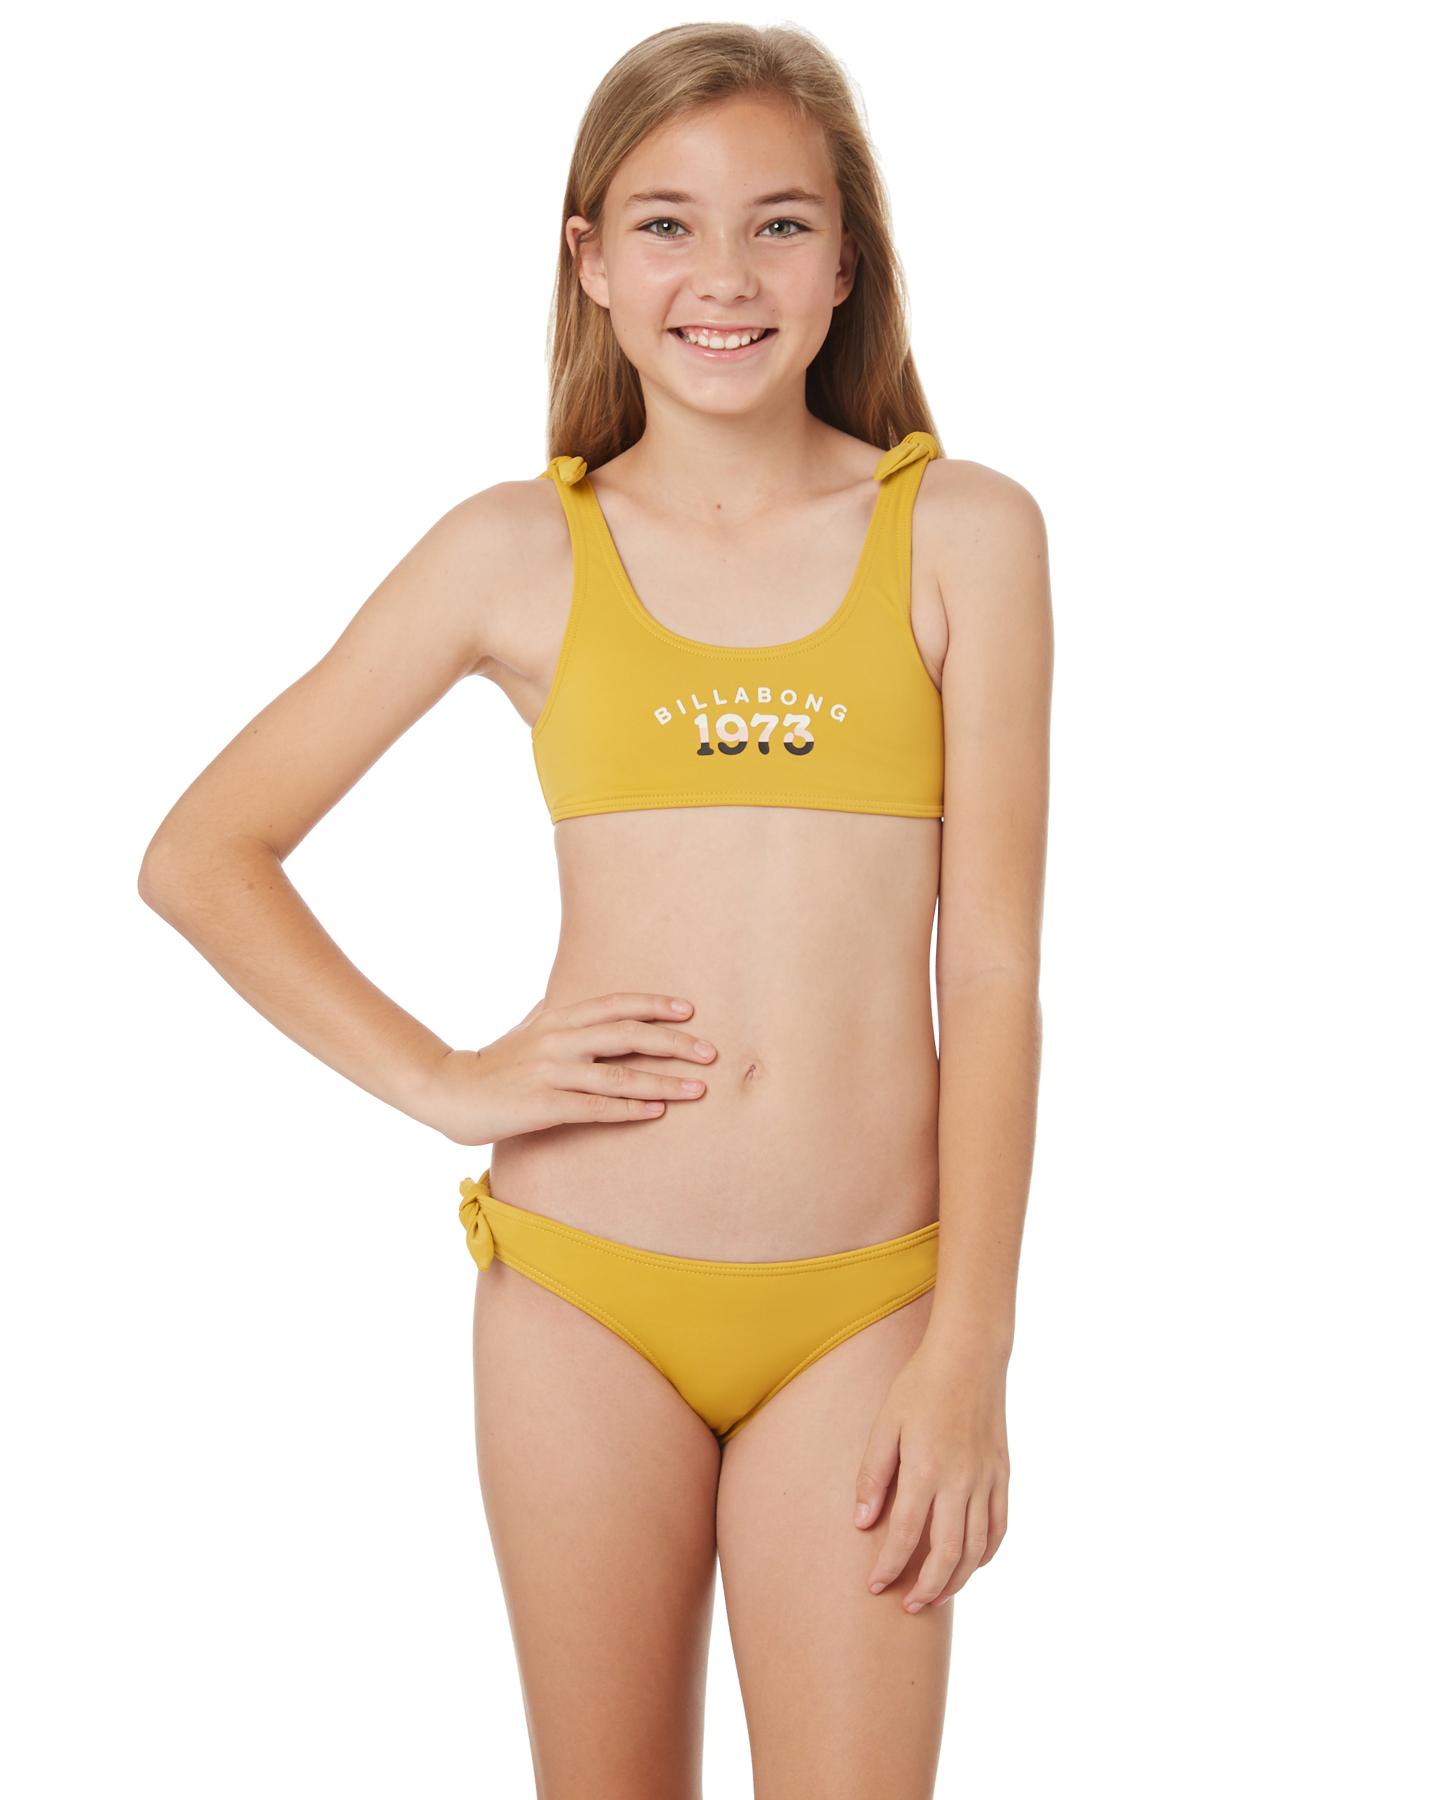 newest 6eeeb 699e3 Girls Long Lived Tie Crop Bikini - Teens